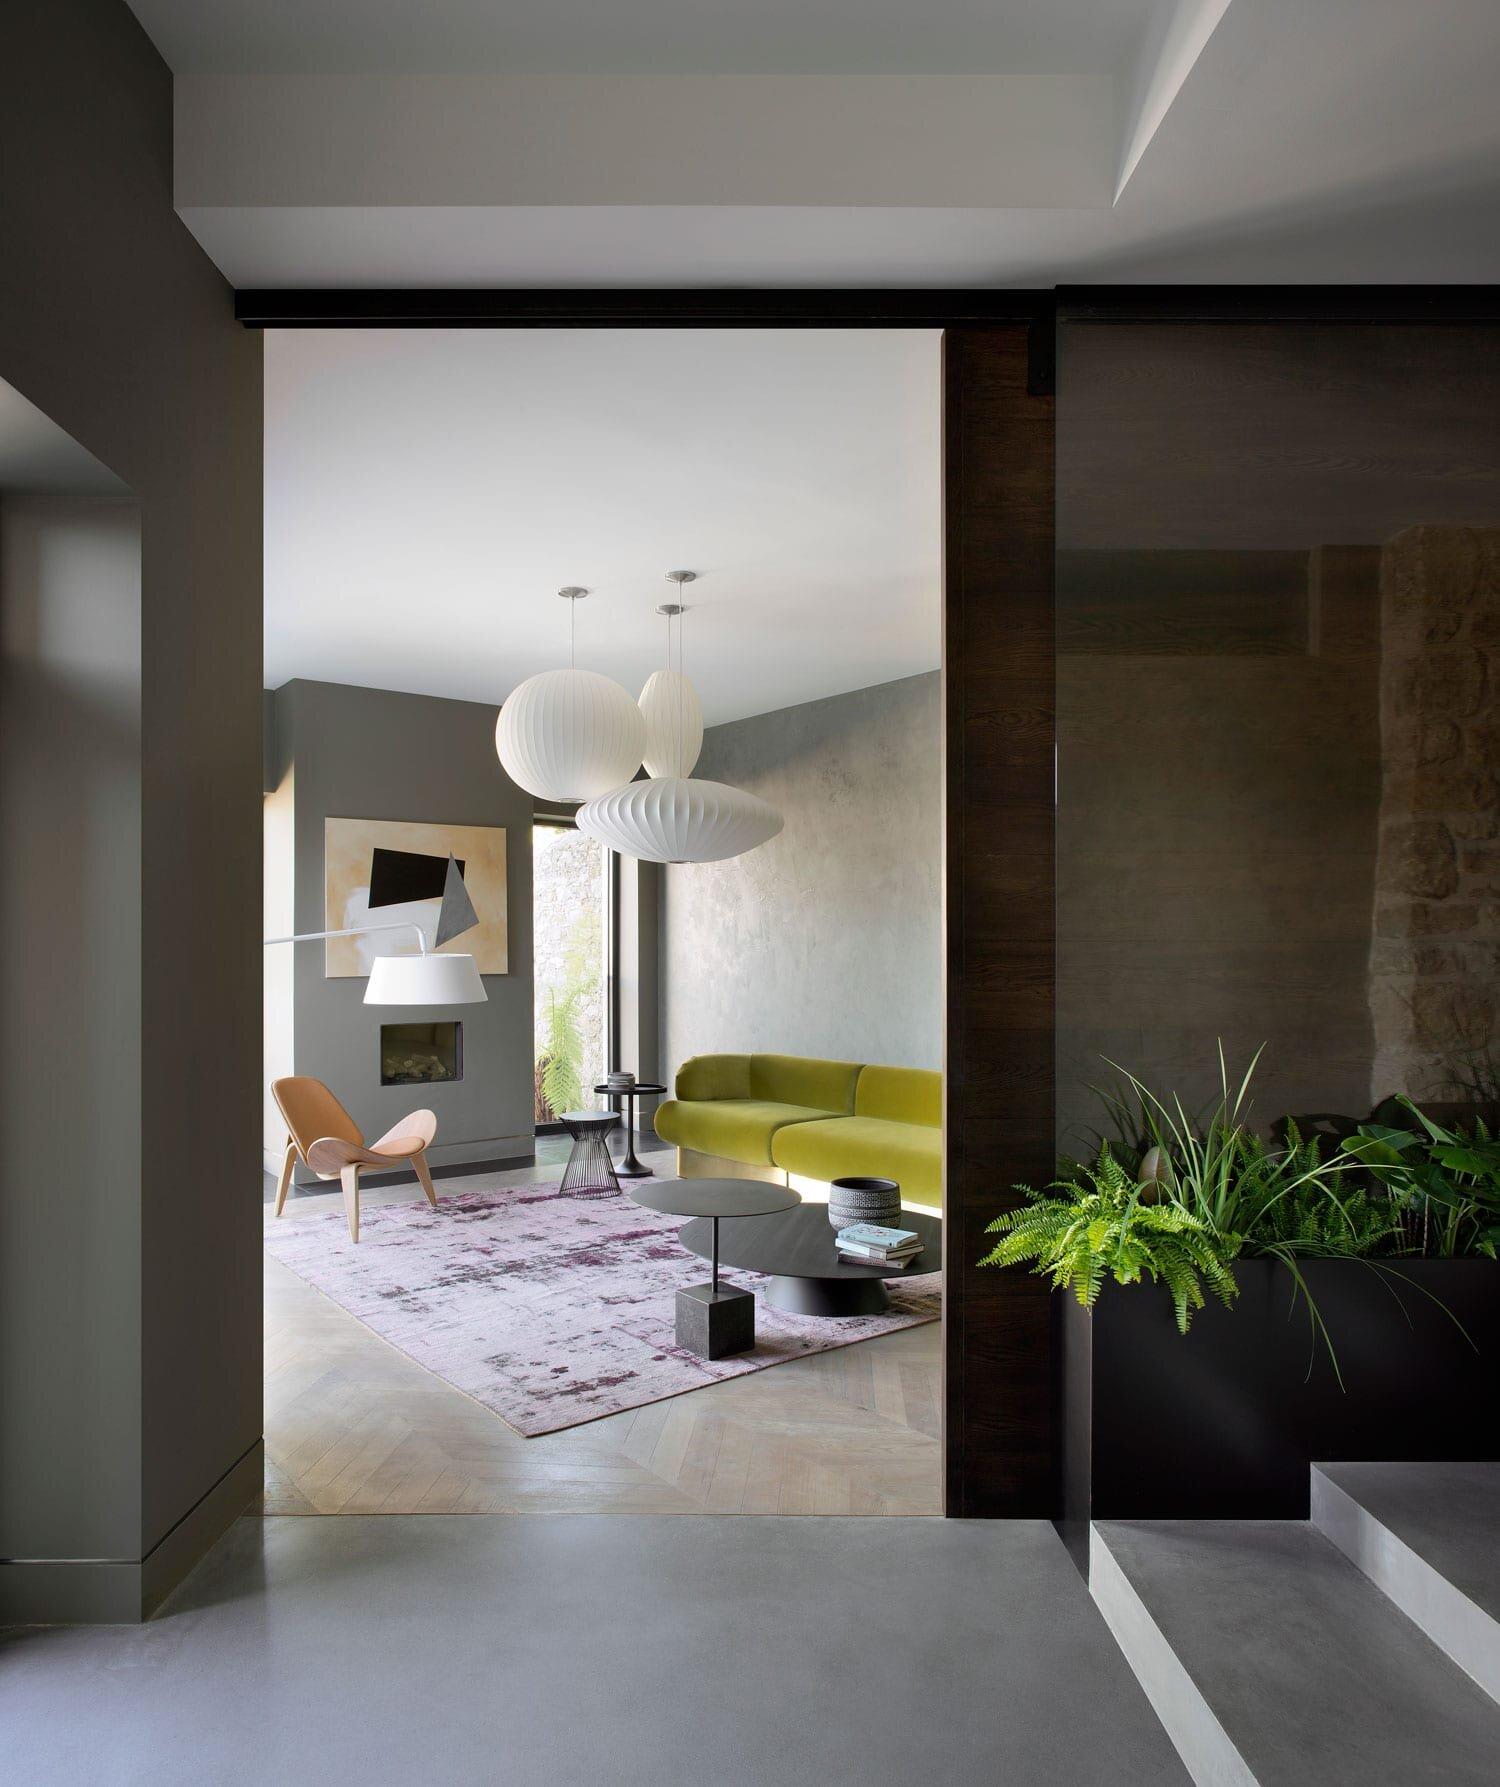 Bolton-Coach-House-Dublin-by-Kingston-Lafferty-Design-Yellowtrace-09.jpg